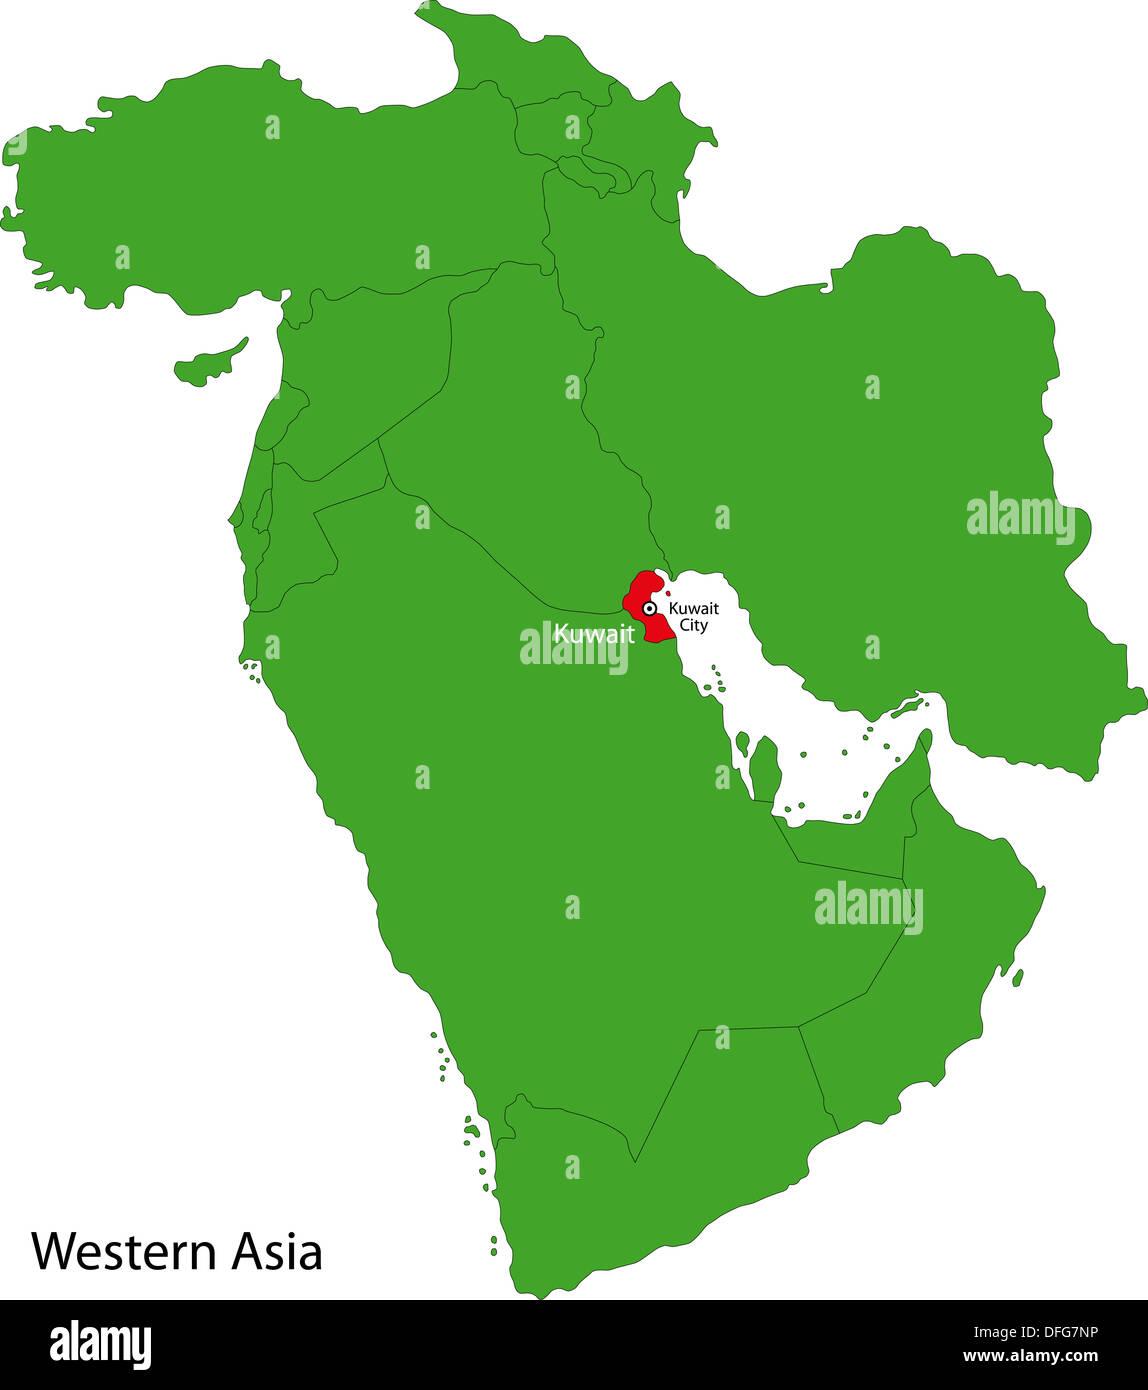 Kuwait map Stock Photo: 61208274 - Alamy